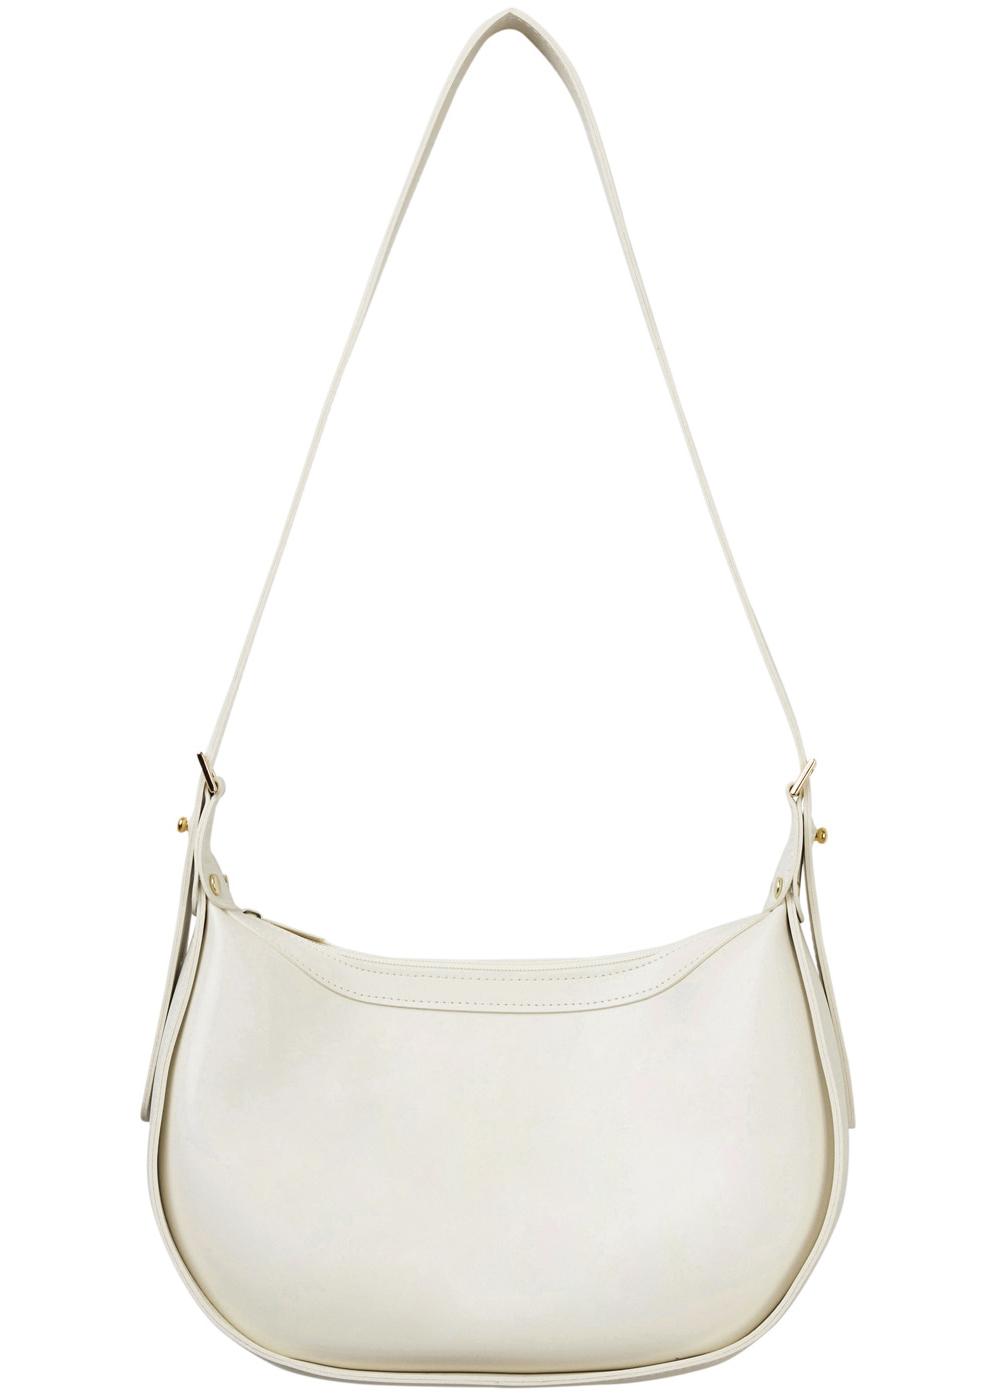 bag white color image-S1L2